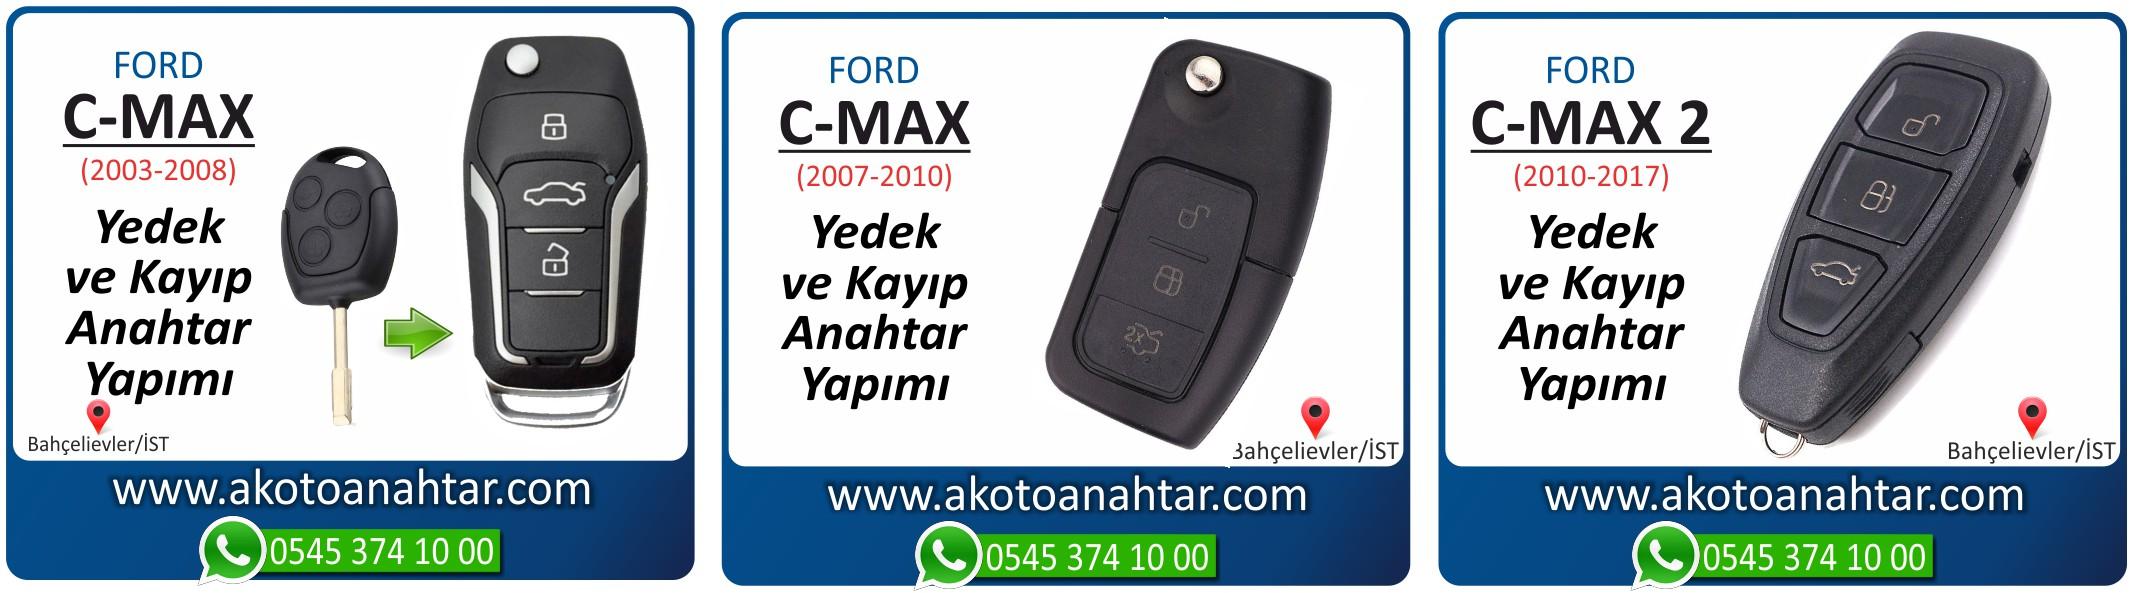 c max cmax anahtari - Ford C-Max 2 Smart Keyless Anahtarı | Yedek ve Kayıp Anahtar Yapımı